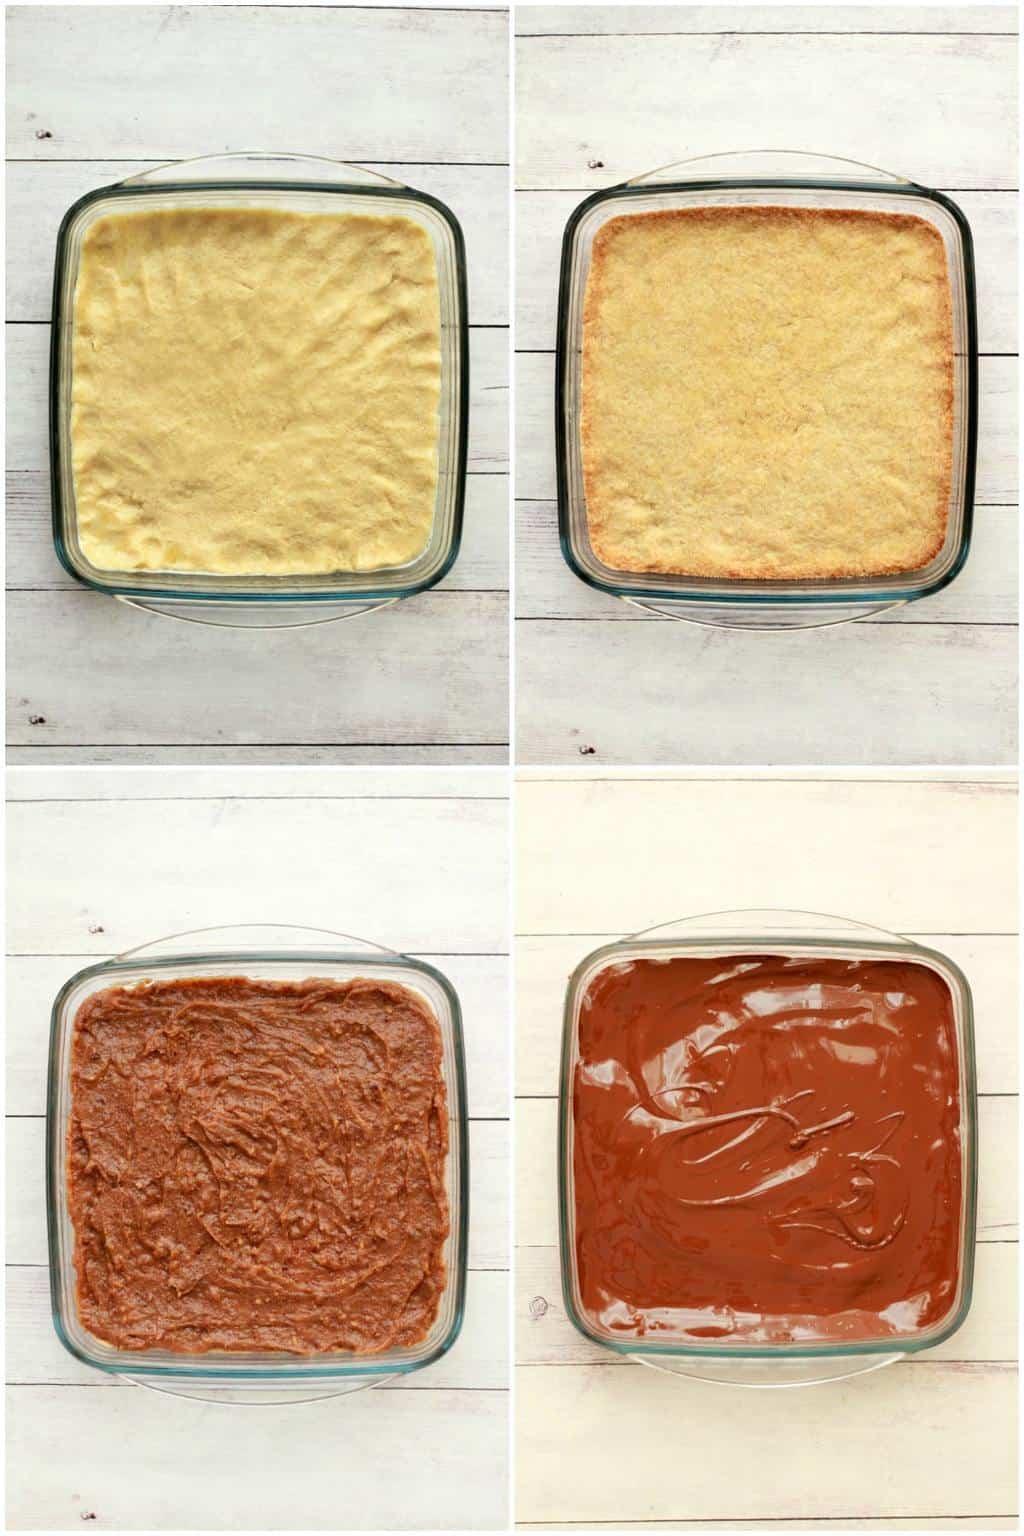 Making Homemade Twix Bars #vegan #lovingitvegan #twixbars #twix #dessert